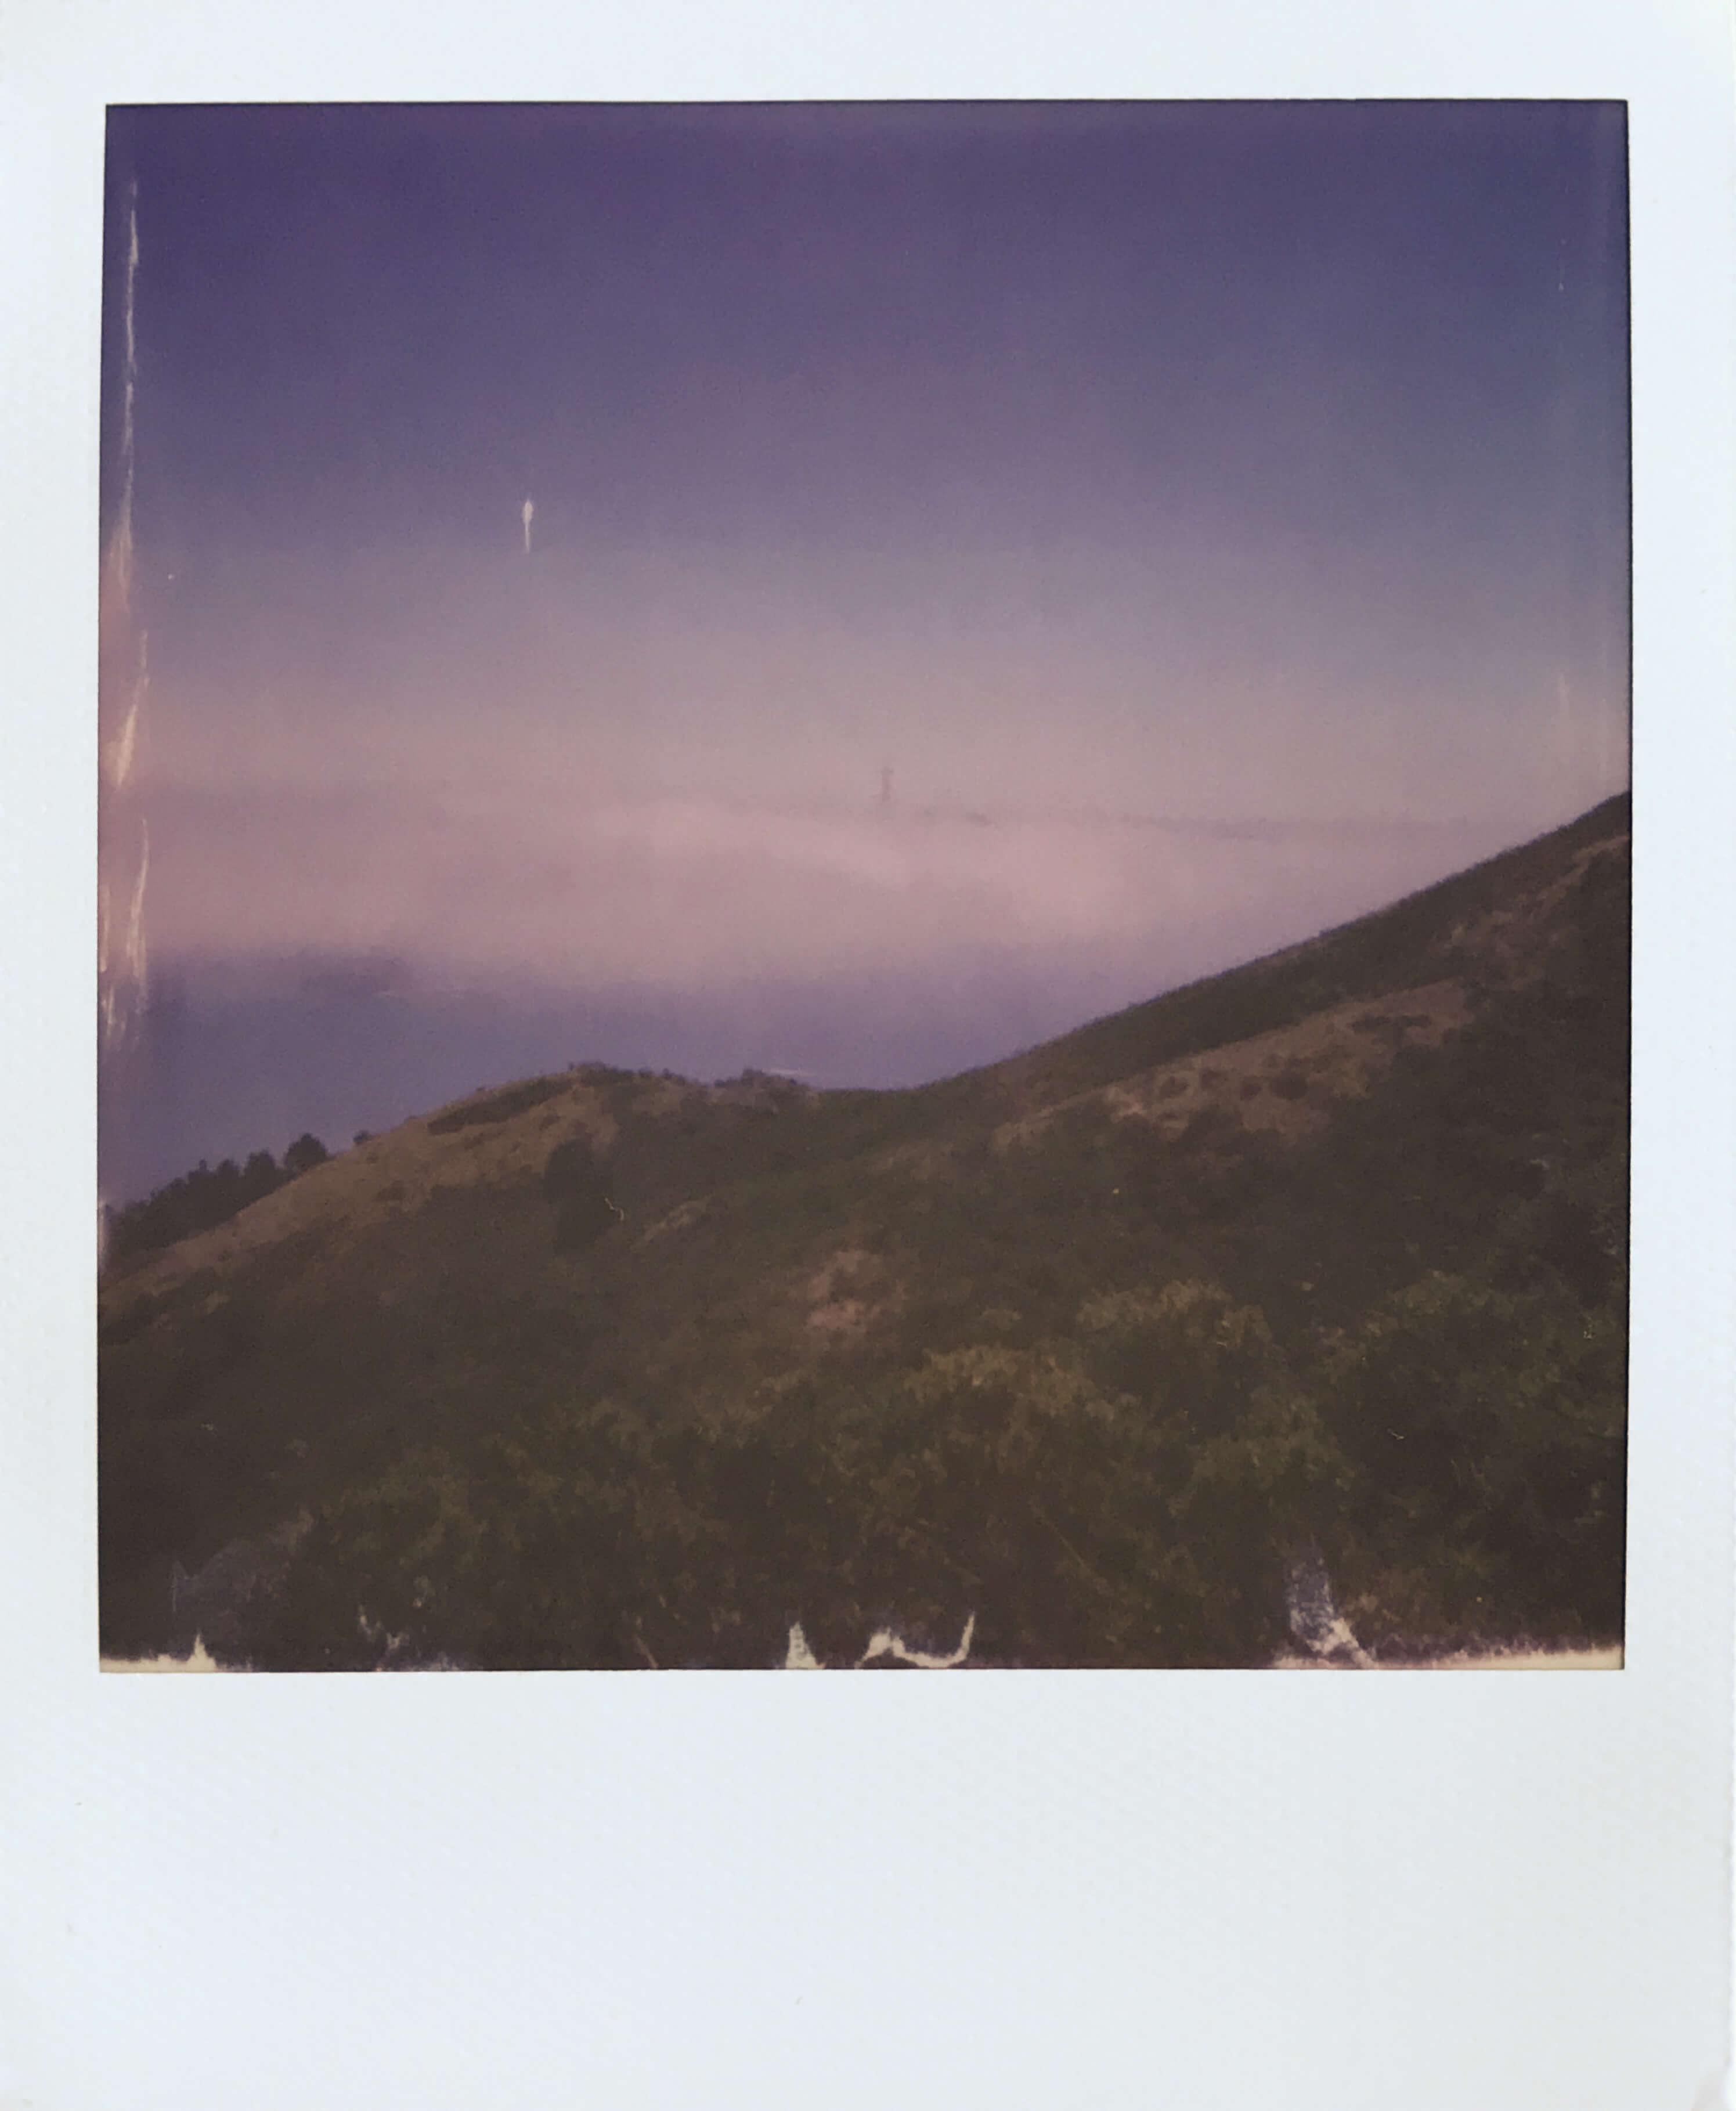 Fog from the Marin Headlands